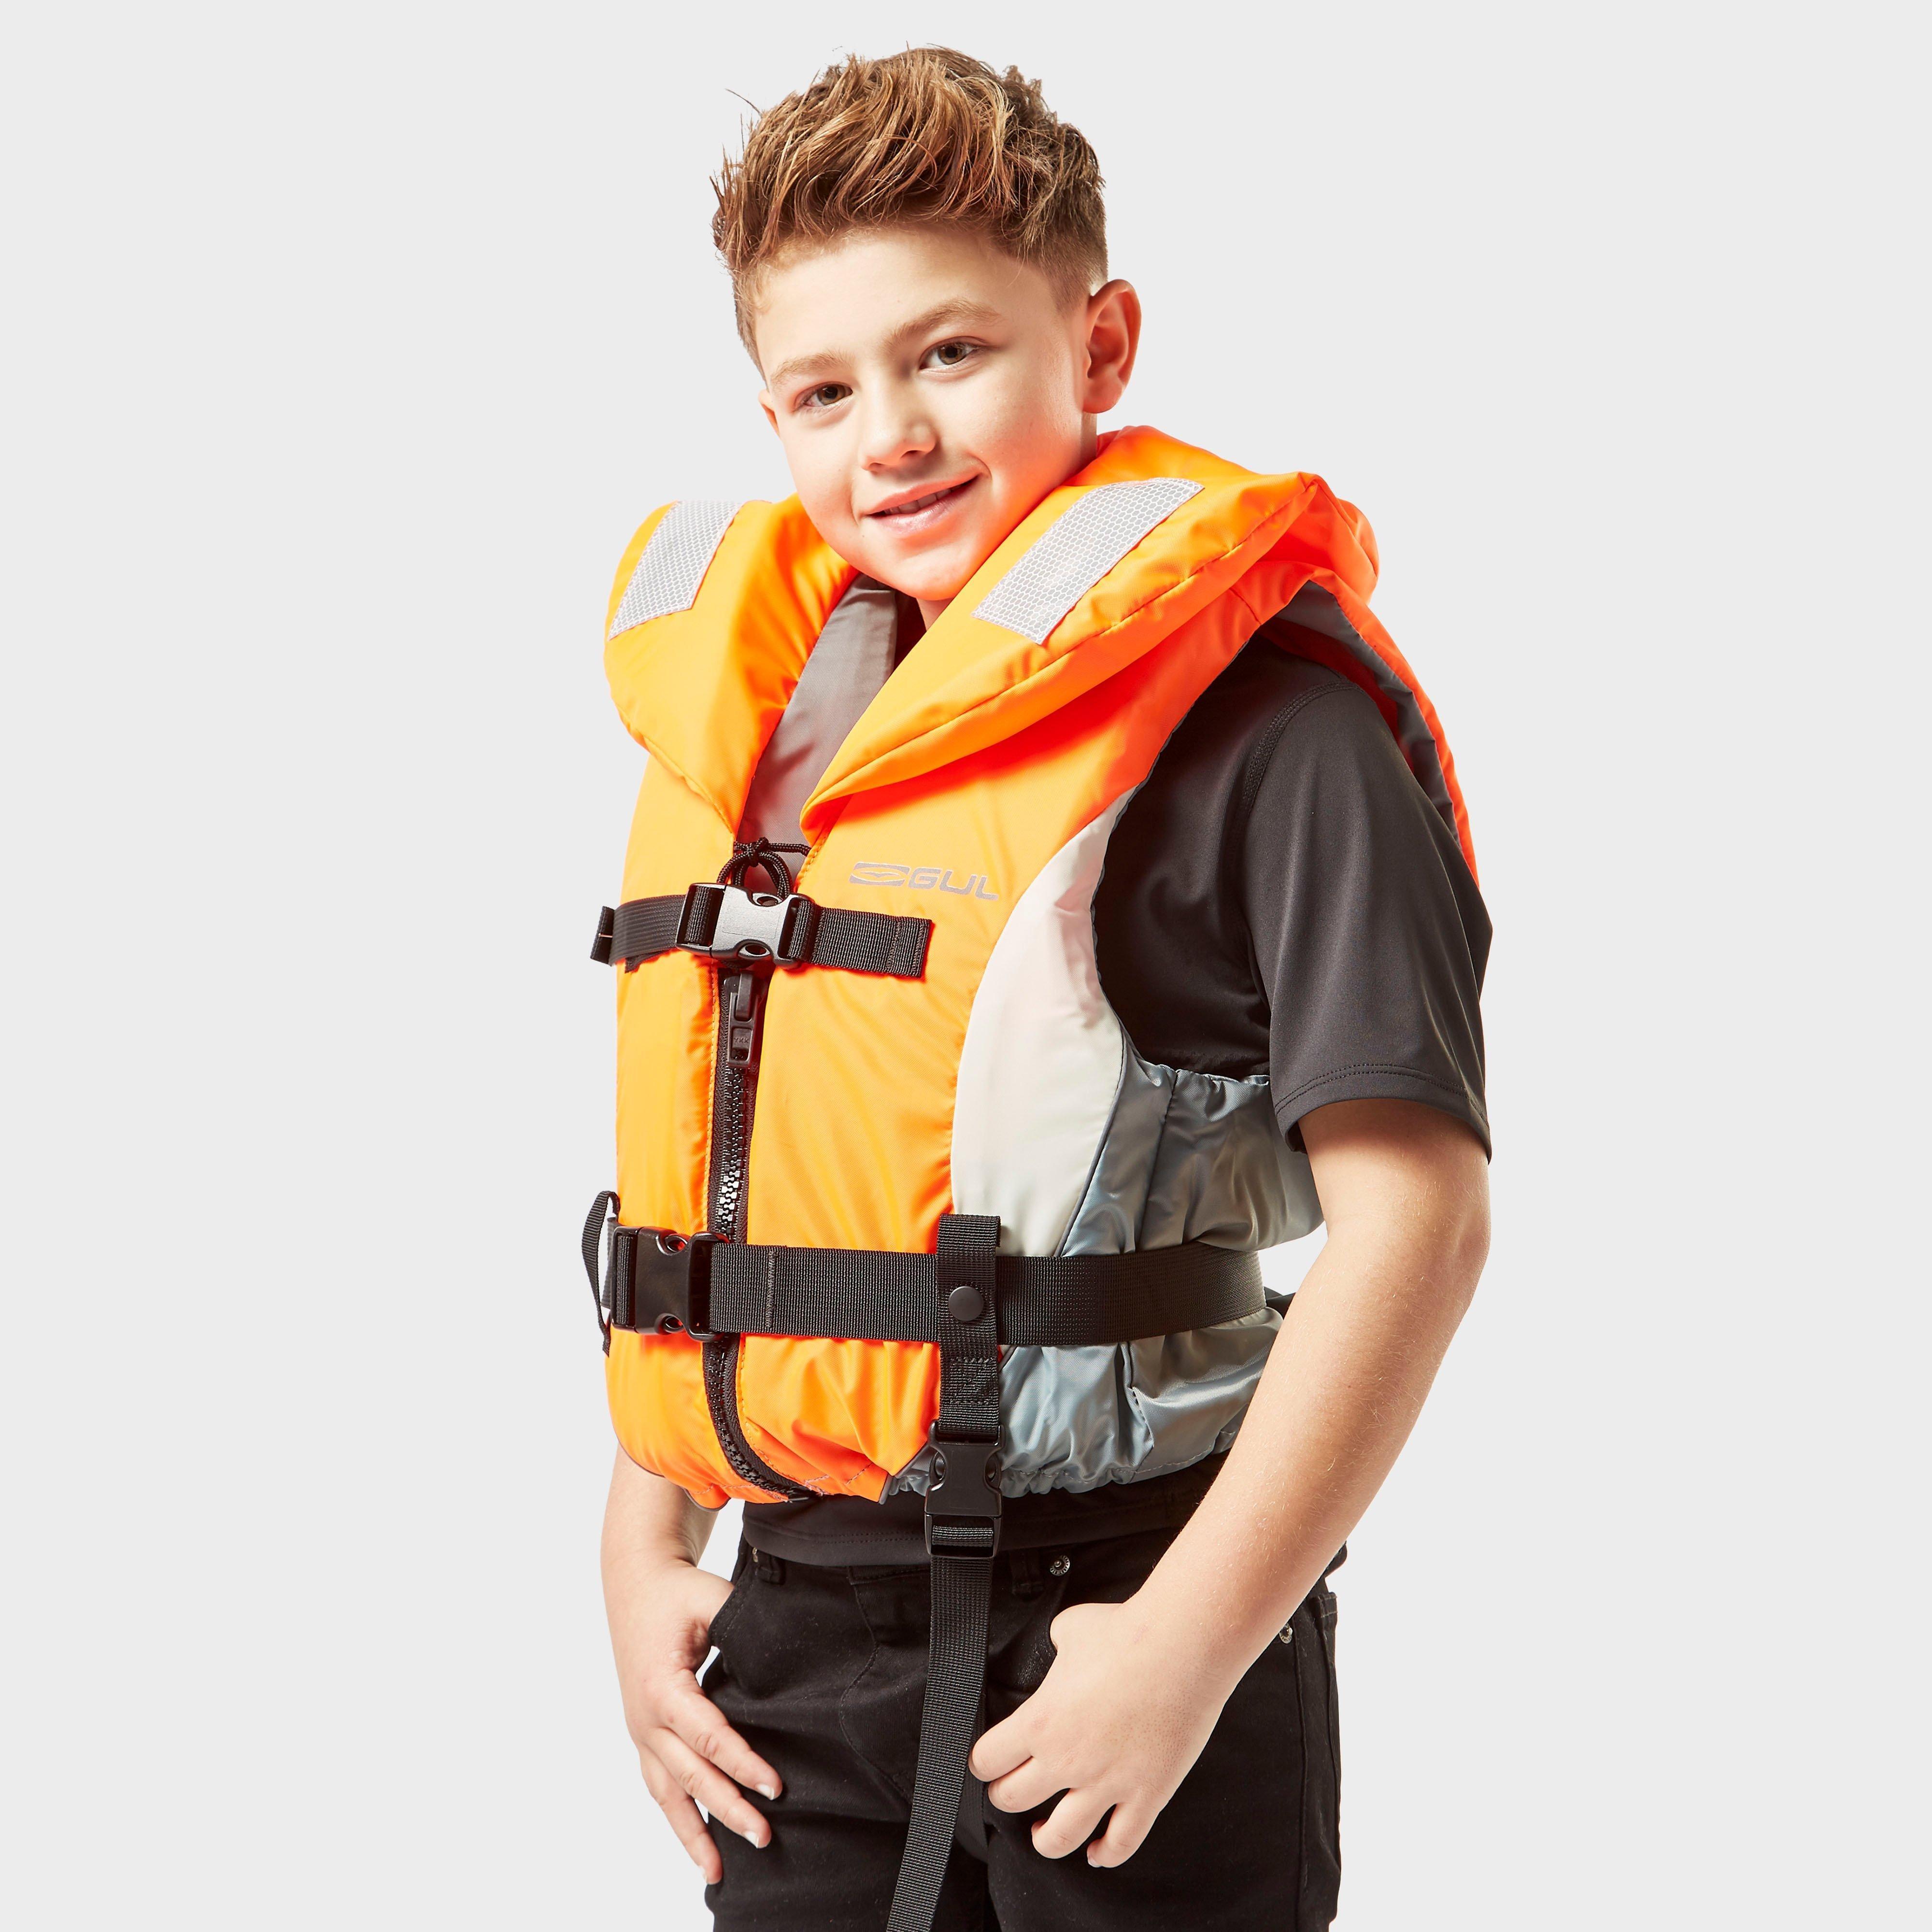 Gul Watersports Gul Watersports 100N Dartmouth Childs Lifejacket - Orange, Orange